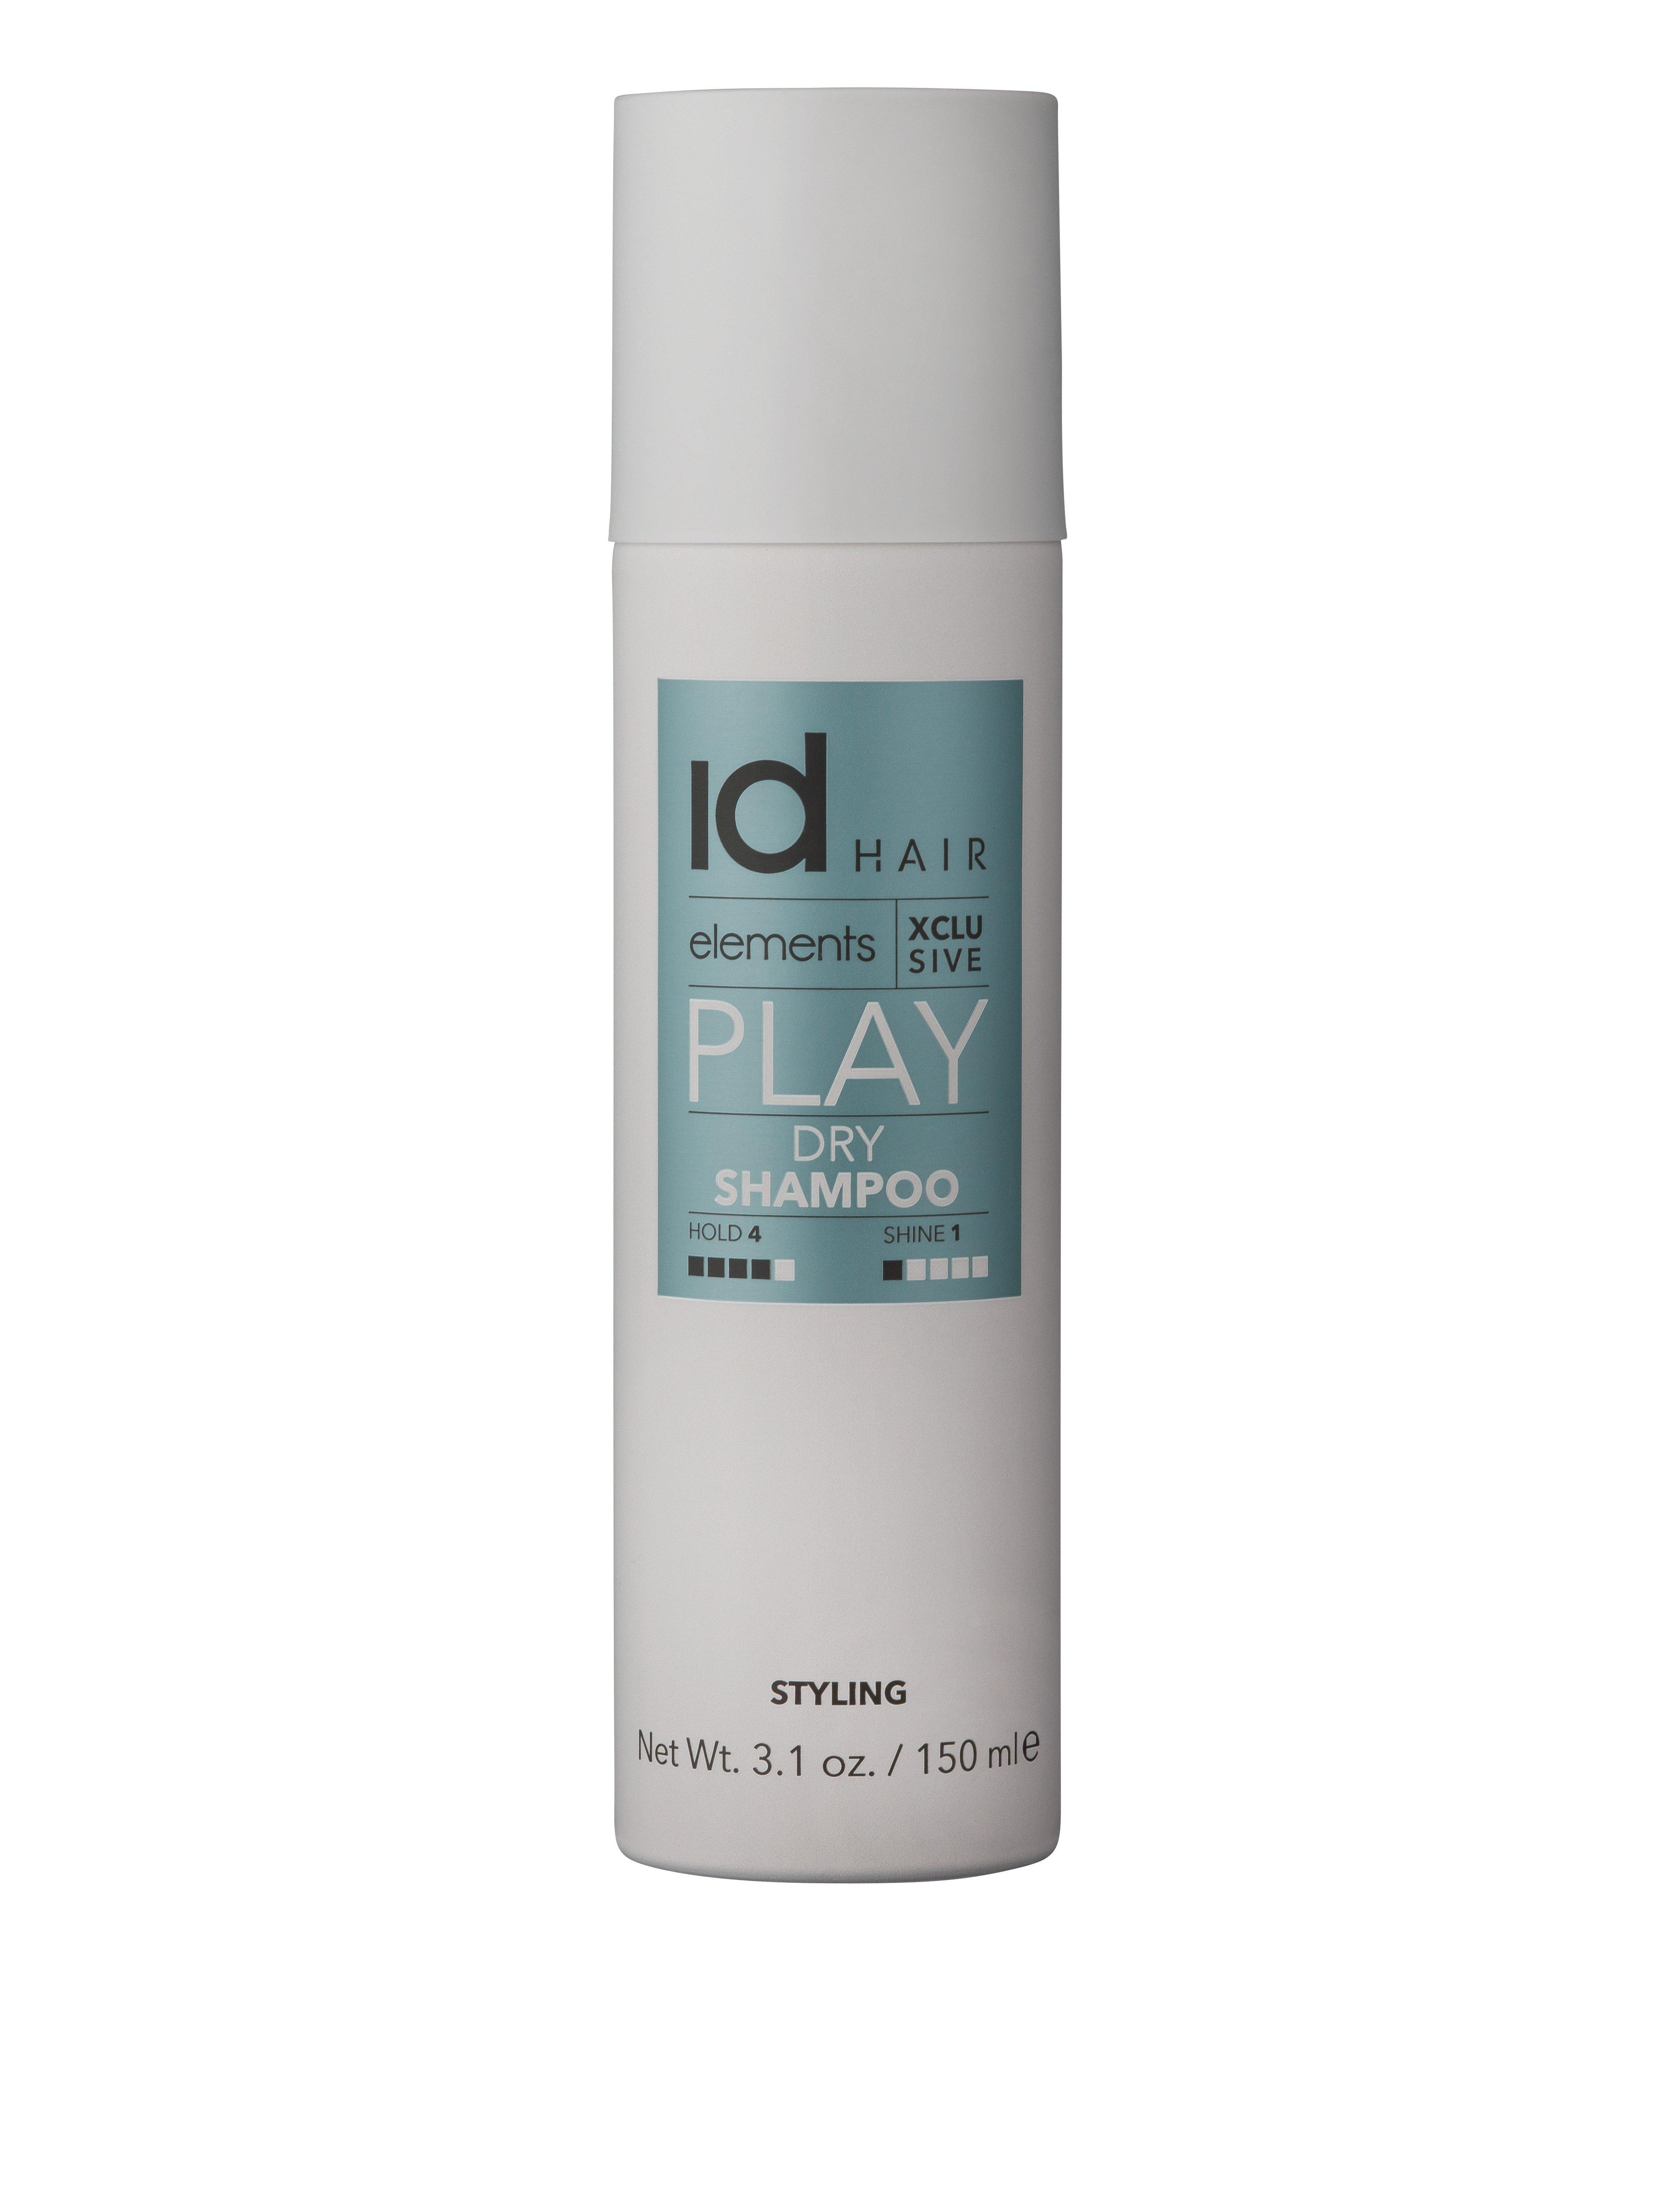 IdHAIR - Elements Xclusive Dry Shampoo 150 ml